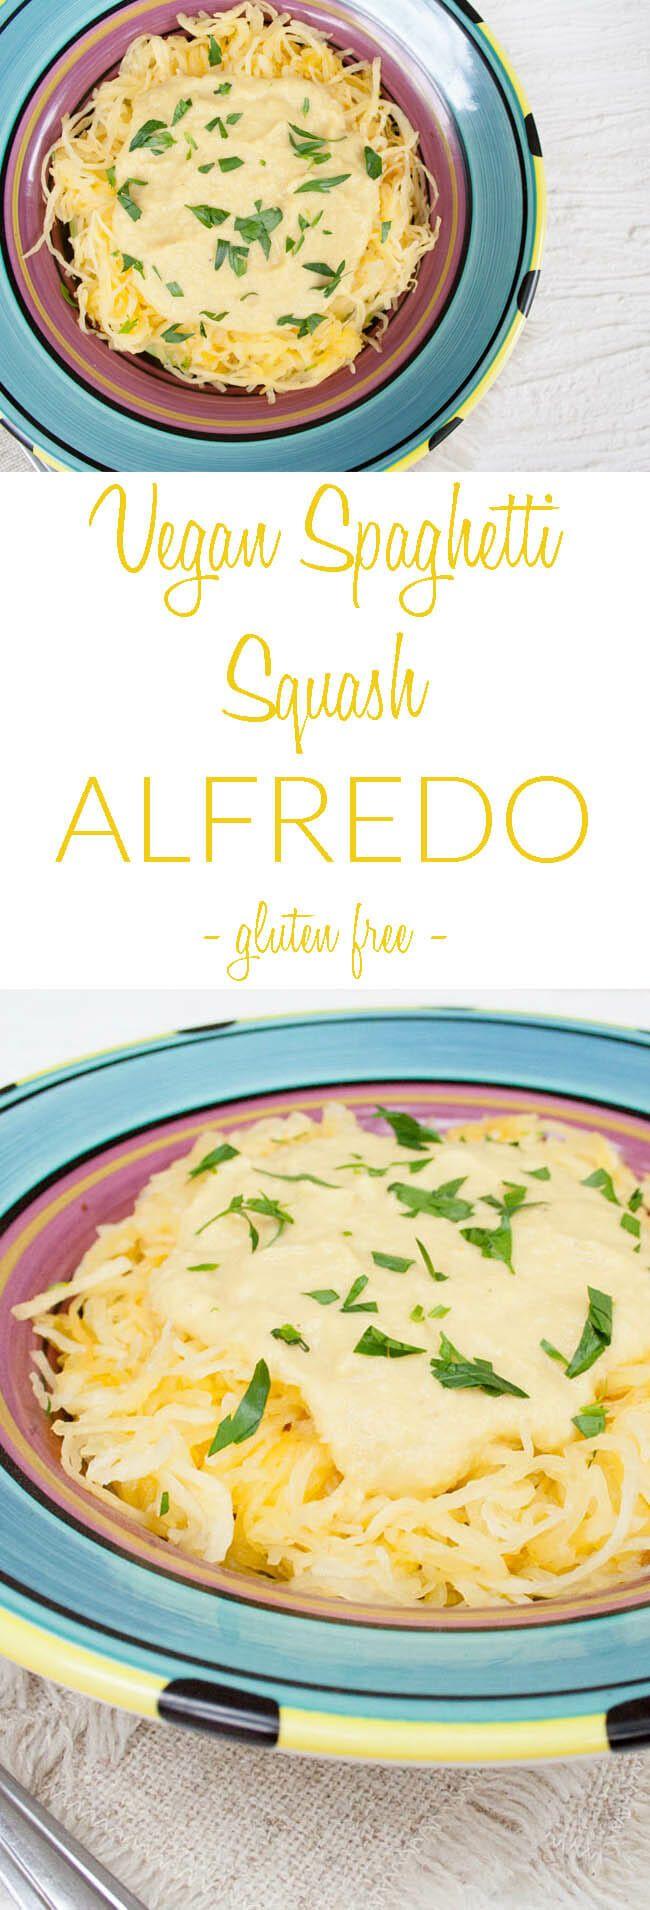 Vegan Spaghetti Squash Alfredo Gluten Free This Creamy Alfredo Recipe Has Big Flavor Vegan Spaghetti Vegan Spaghetti Squash Spaghetti Squash Recipes Vegan